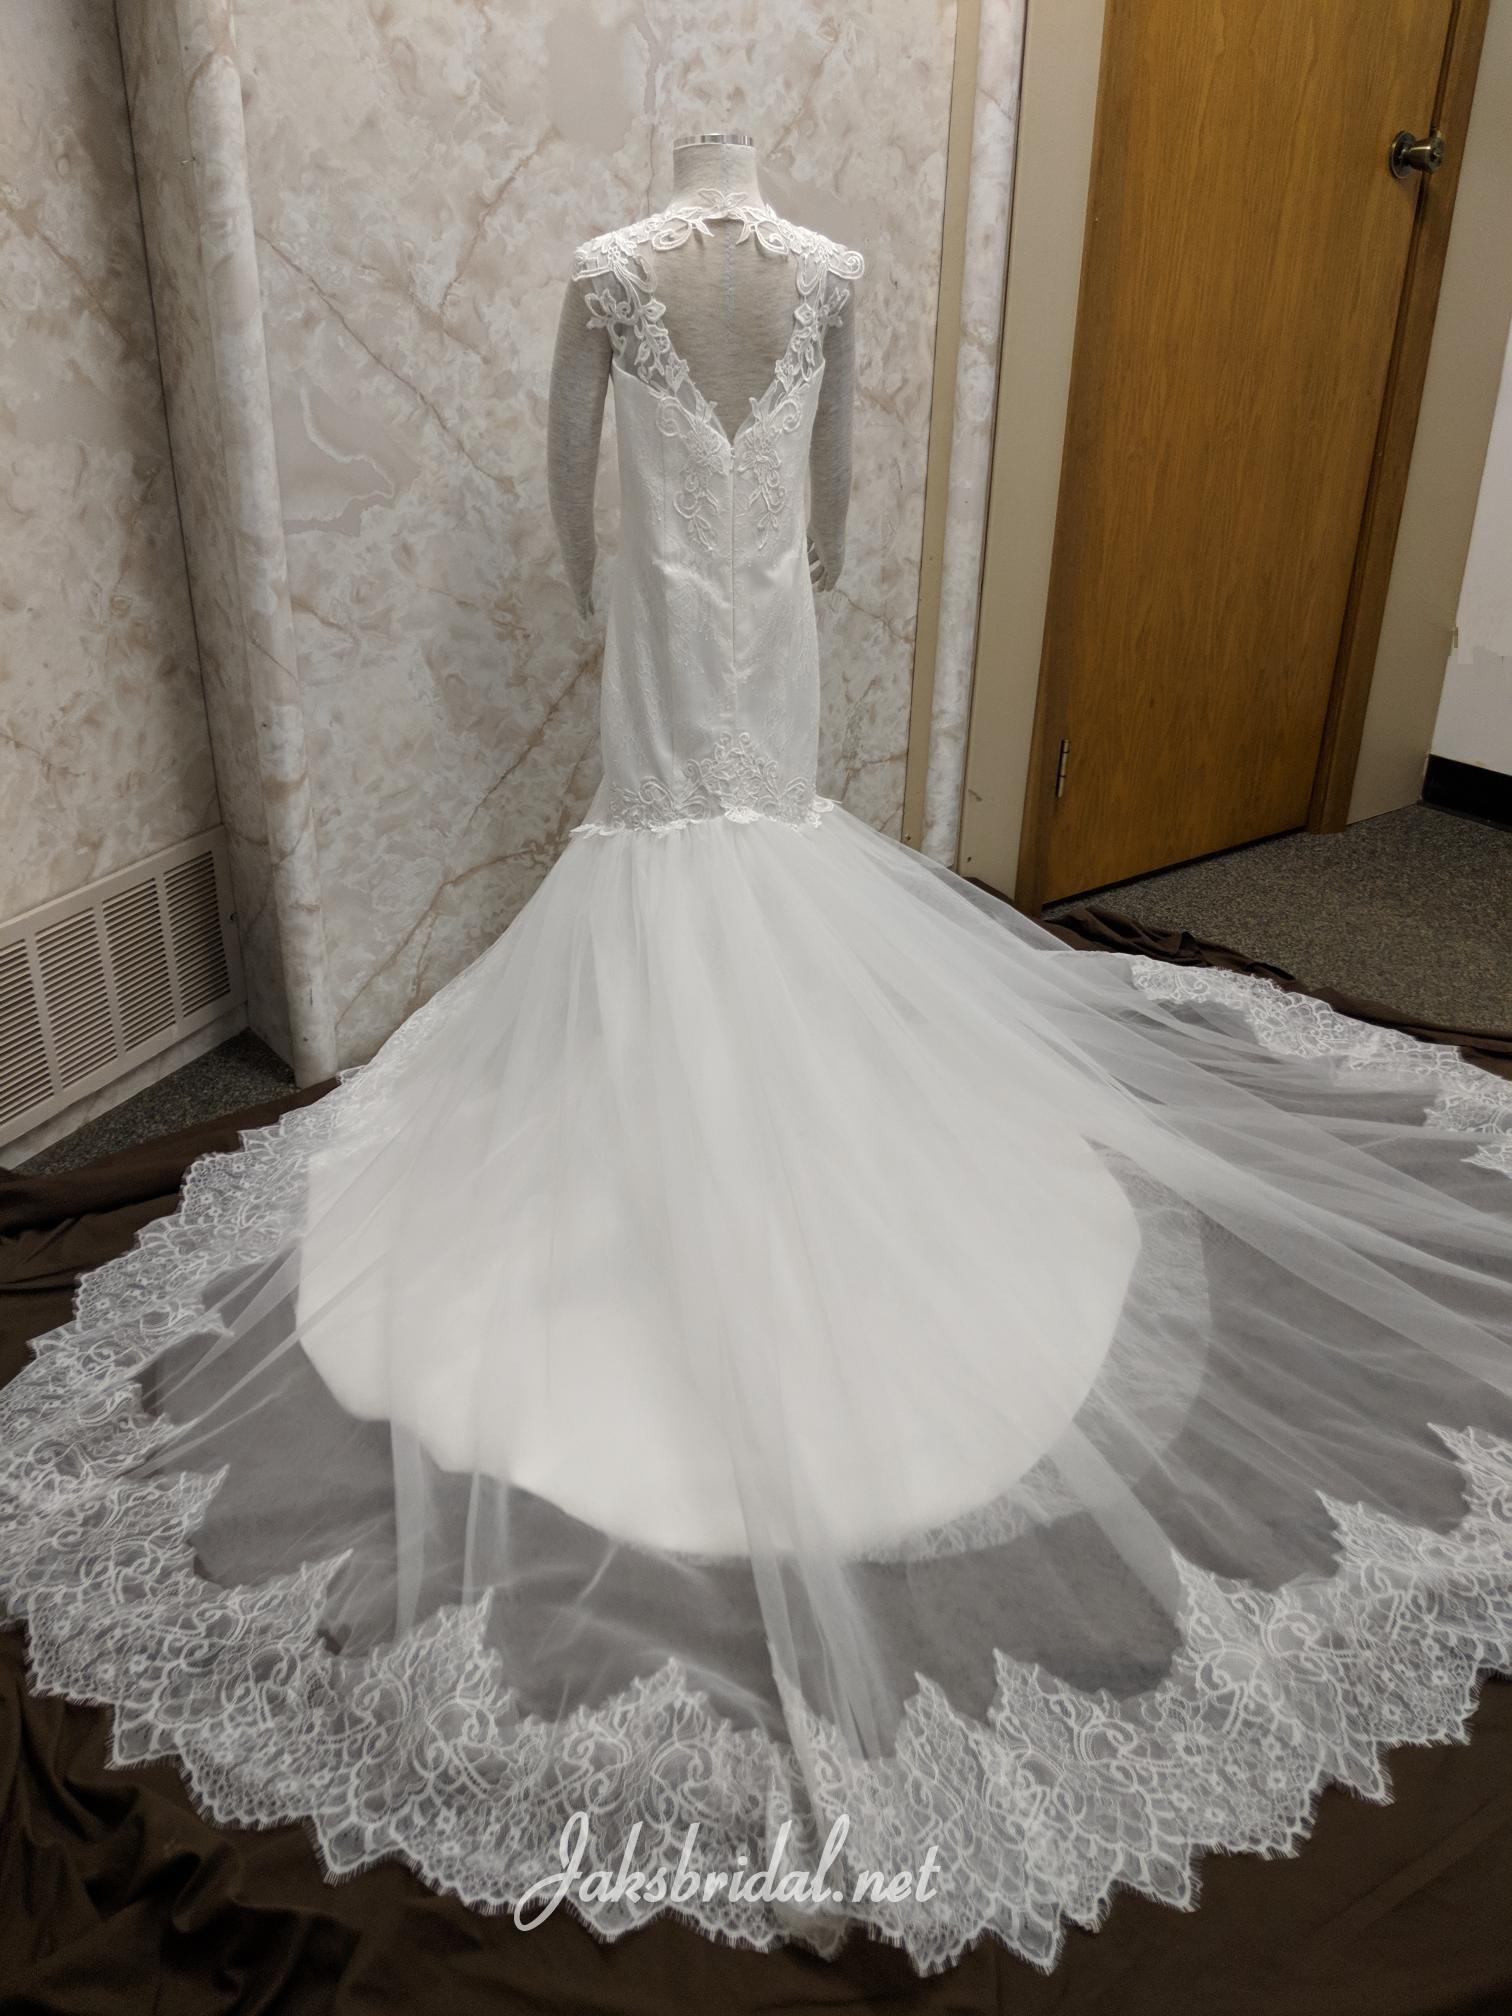 0c2c5b8f757 ... flower girl wedding dress